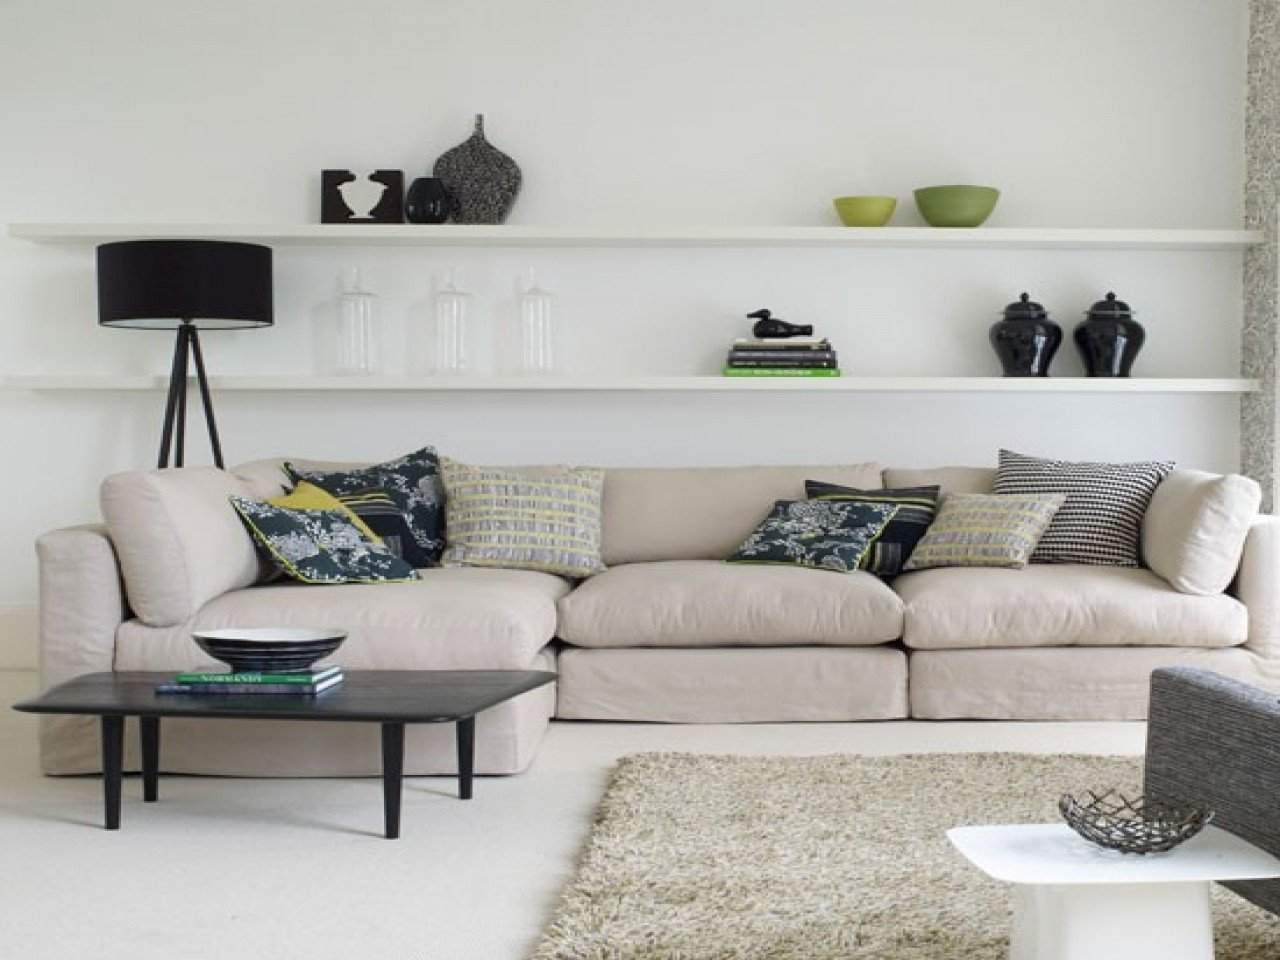 Living Room Ideas Shelves Awesome Decorating Shelves Living Room